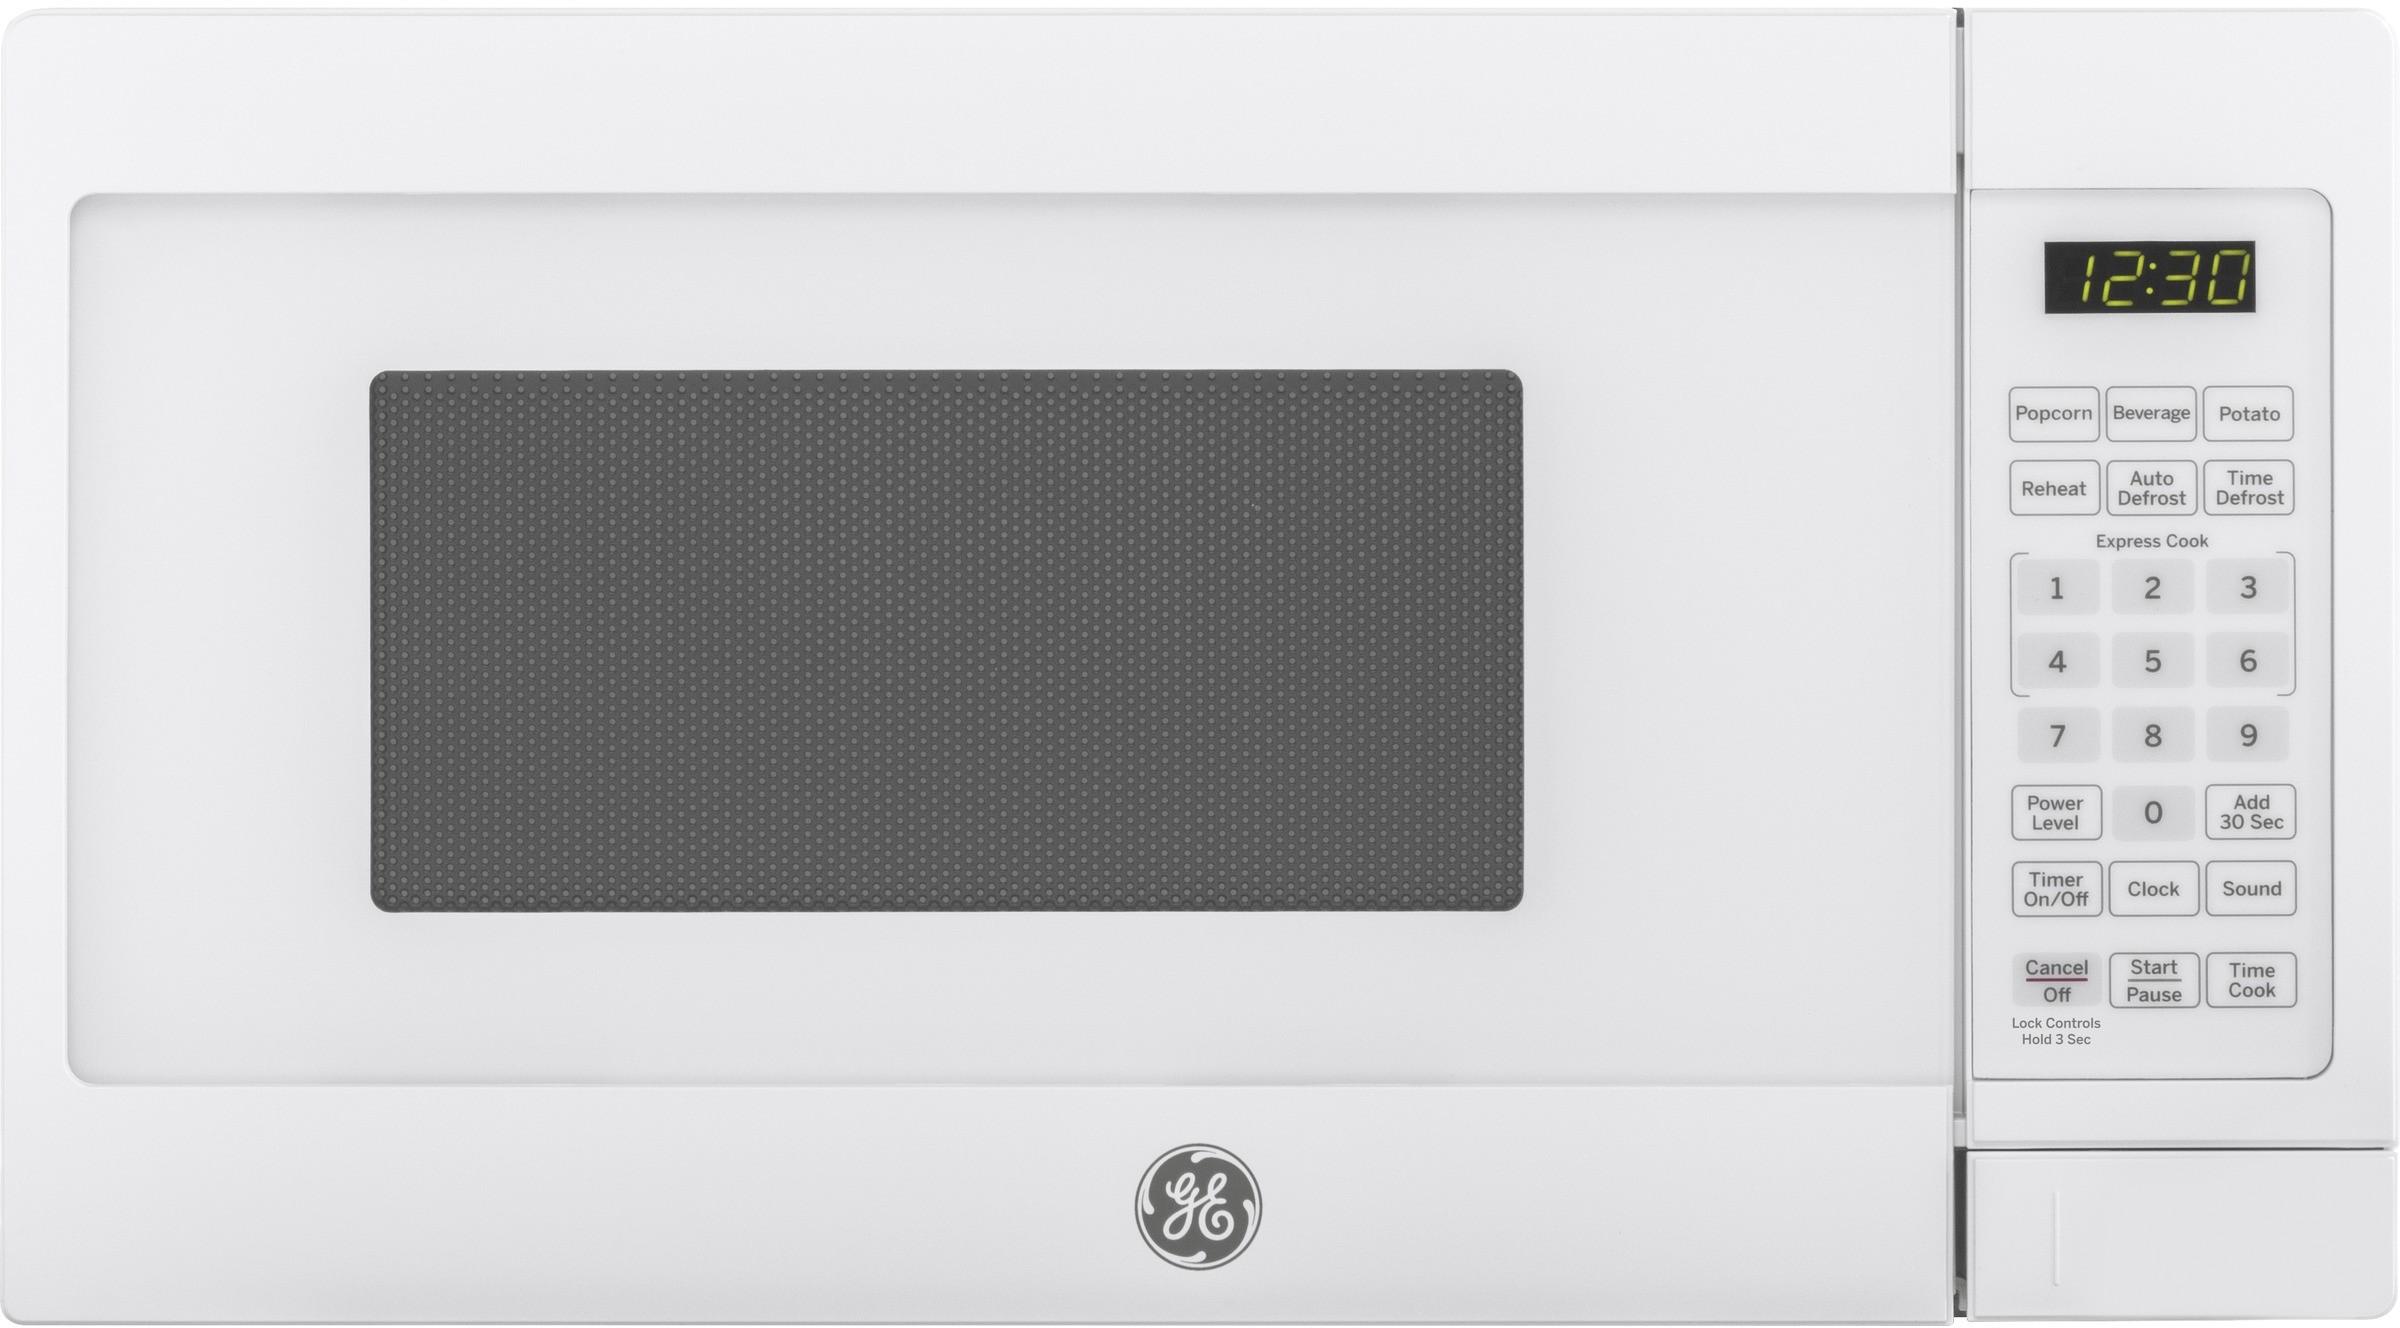 ge 0 7 cu ft countertop microwave oven